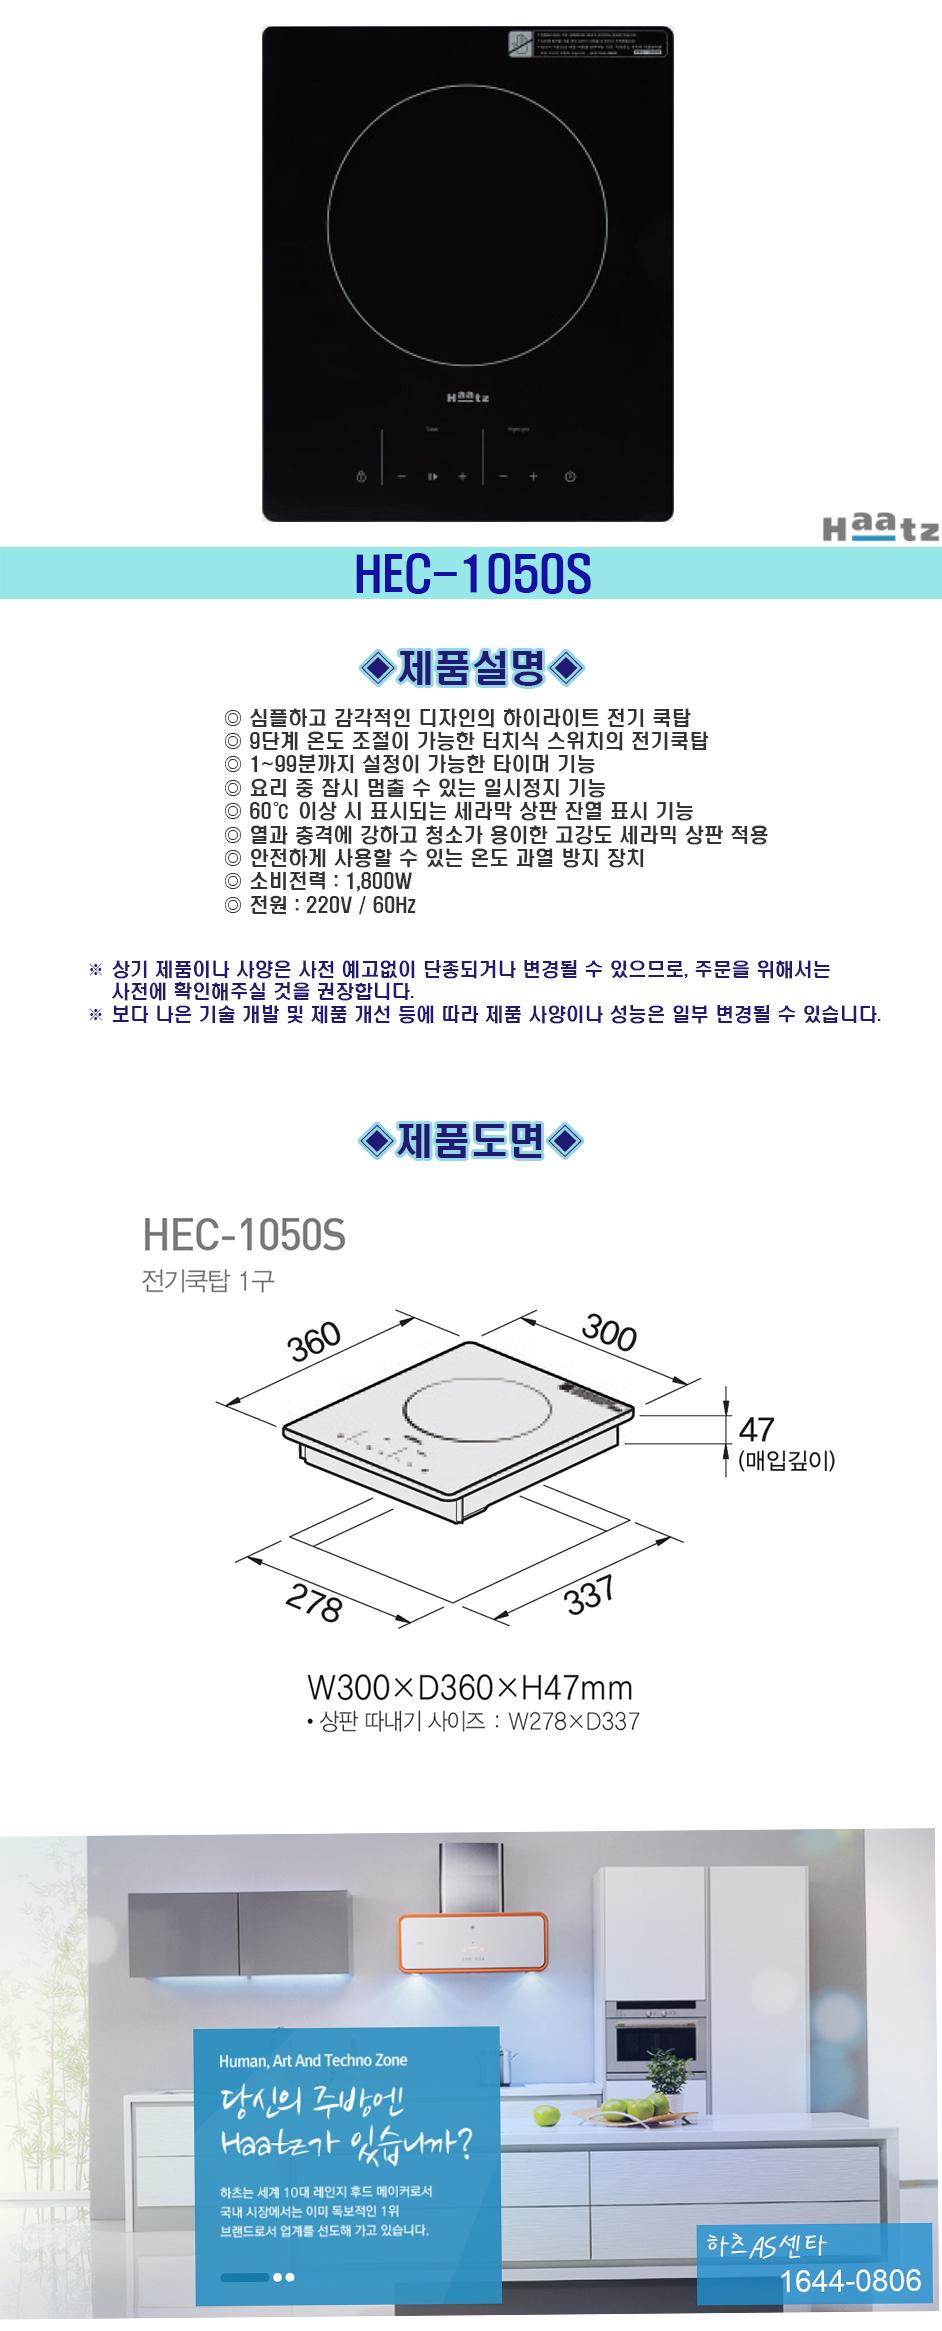 HEC-1050S%20%EC%A0%84%EC%B2%B4.jpg